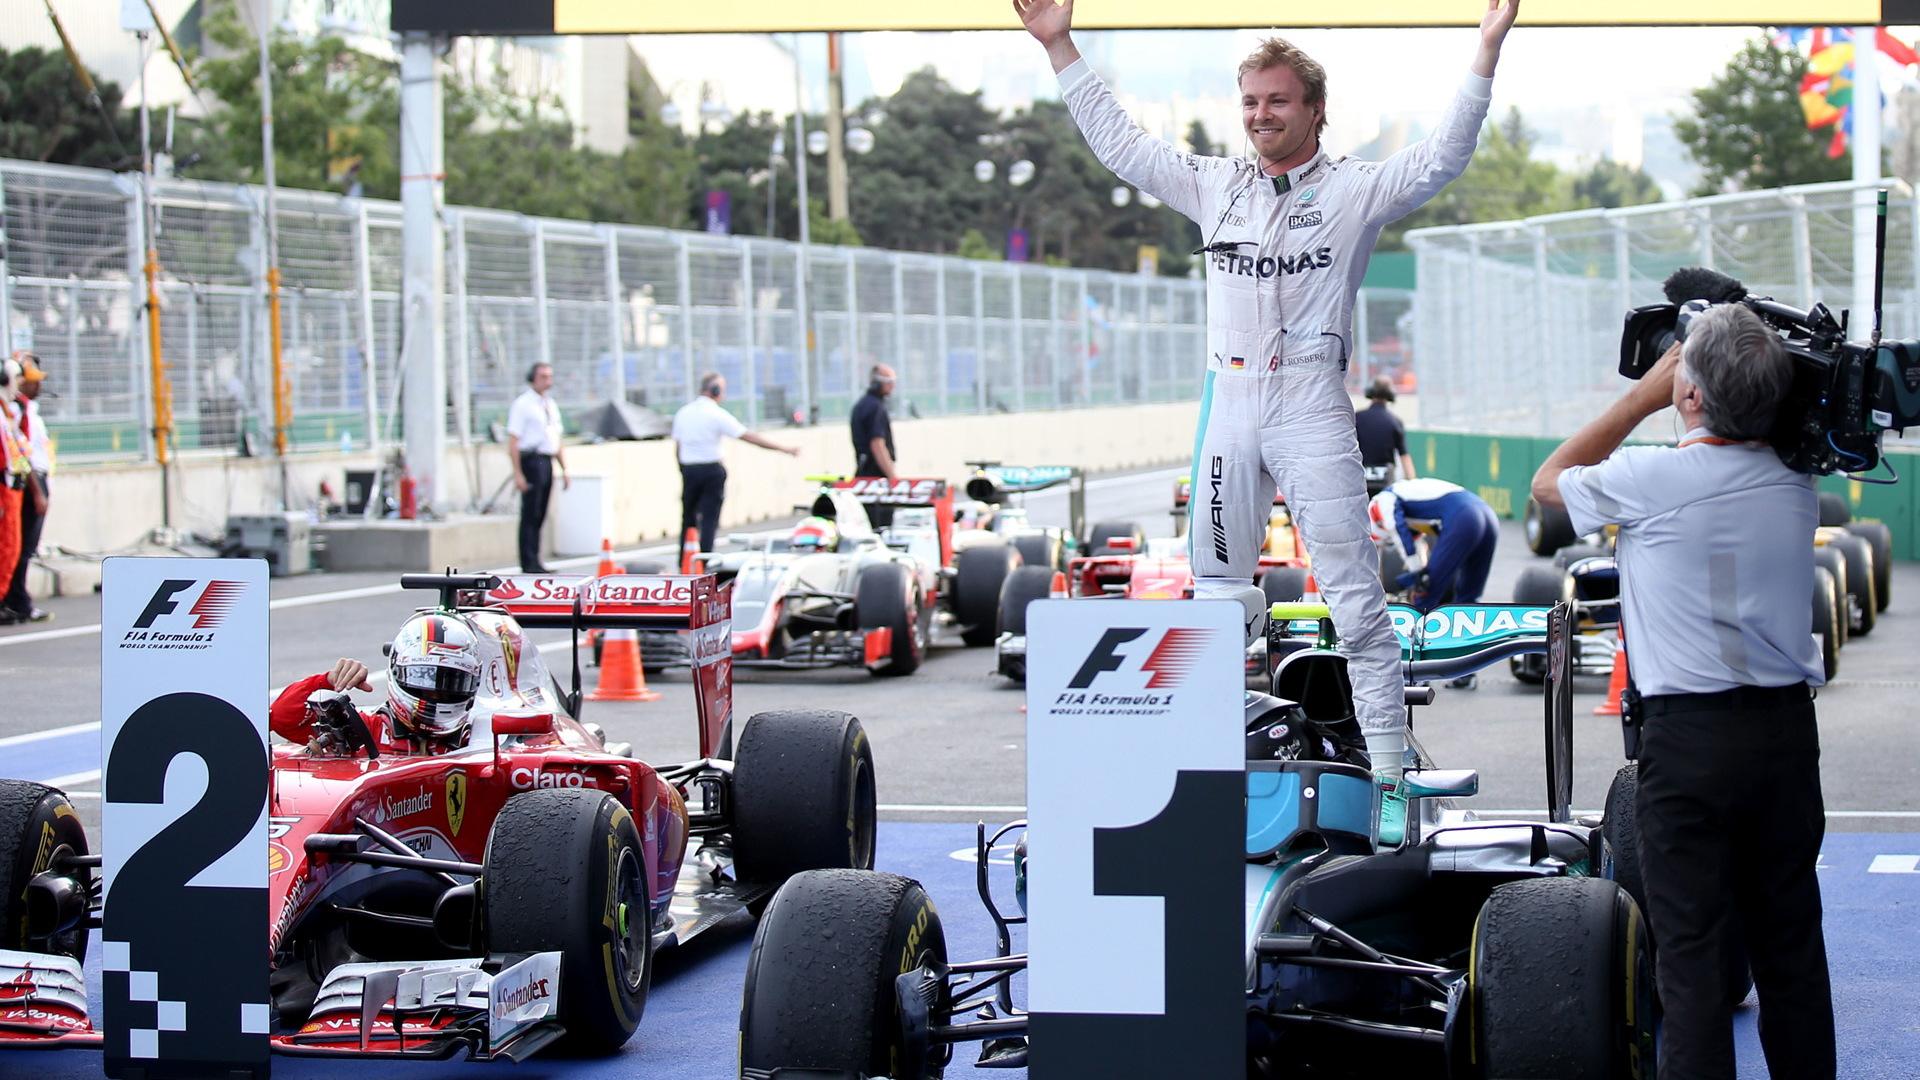 Mercedes AMG's Nico Rosberg after winning the 2016 Formula One European Grand Prix